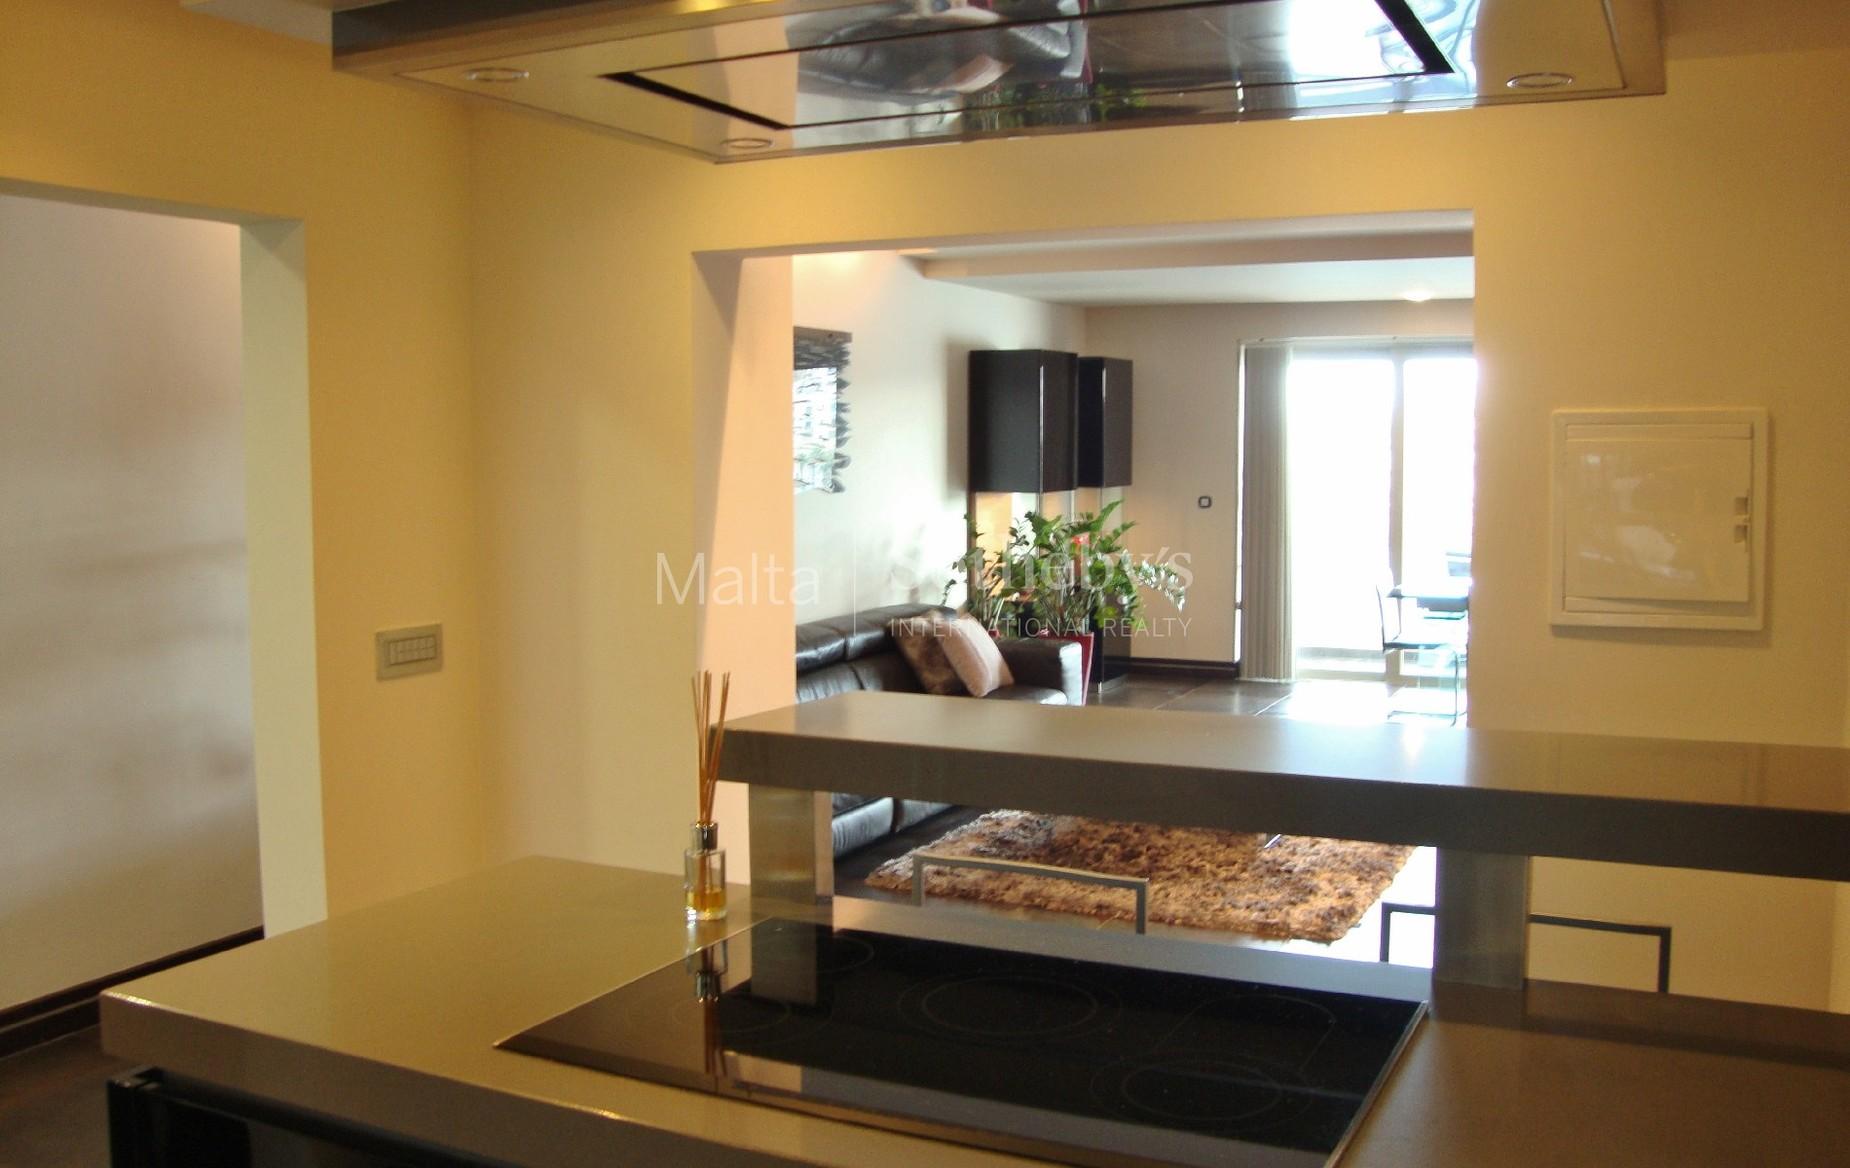 2 bed Apartment For Rent in Marsascala, Marsascala - thumb 4